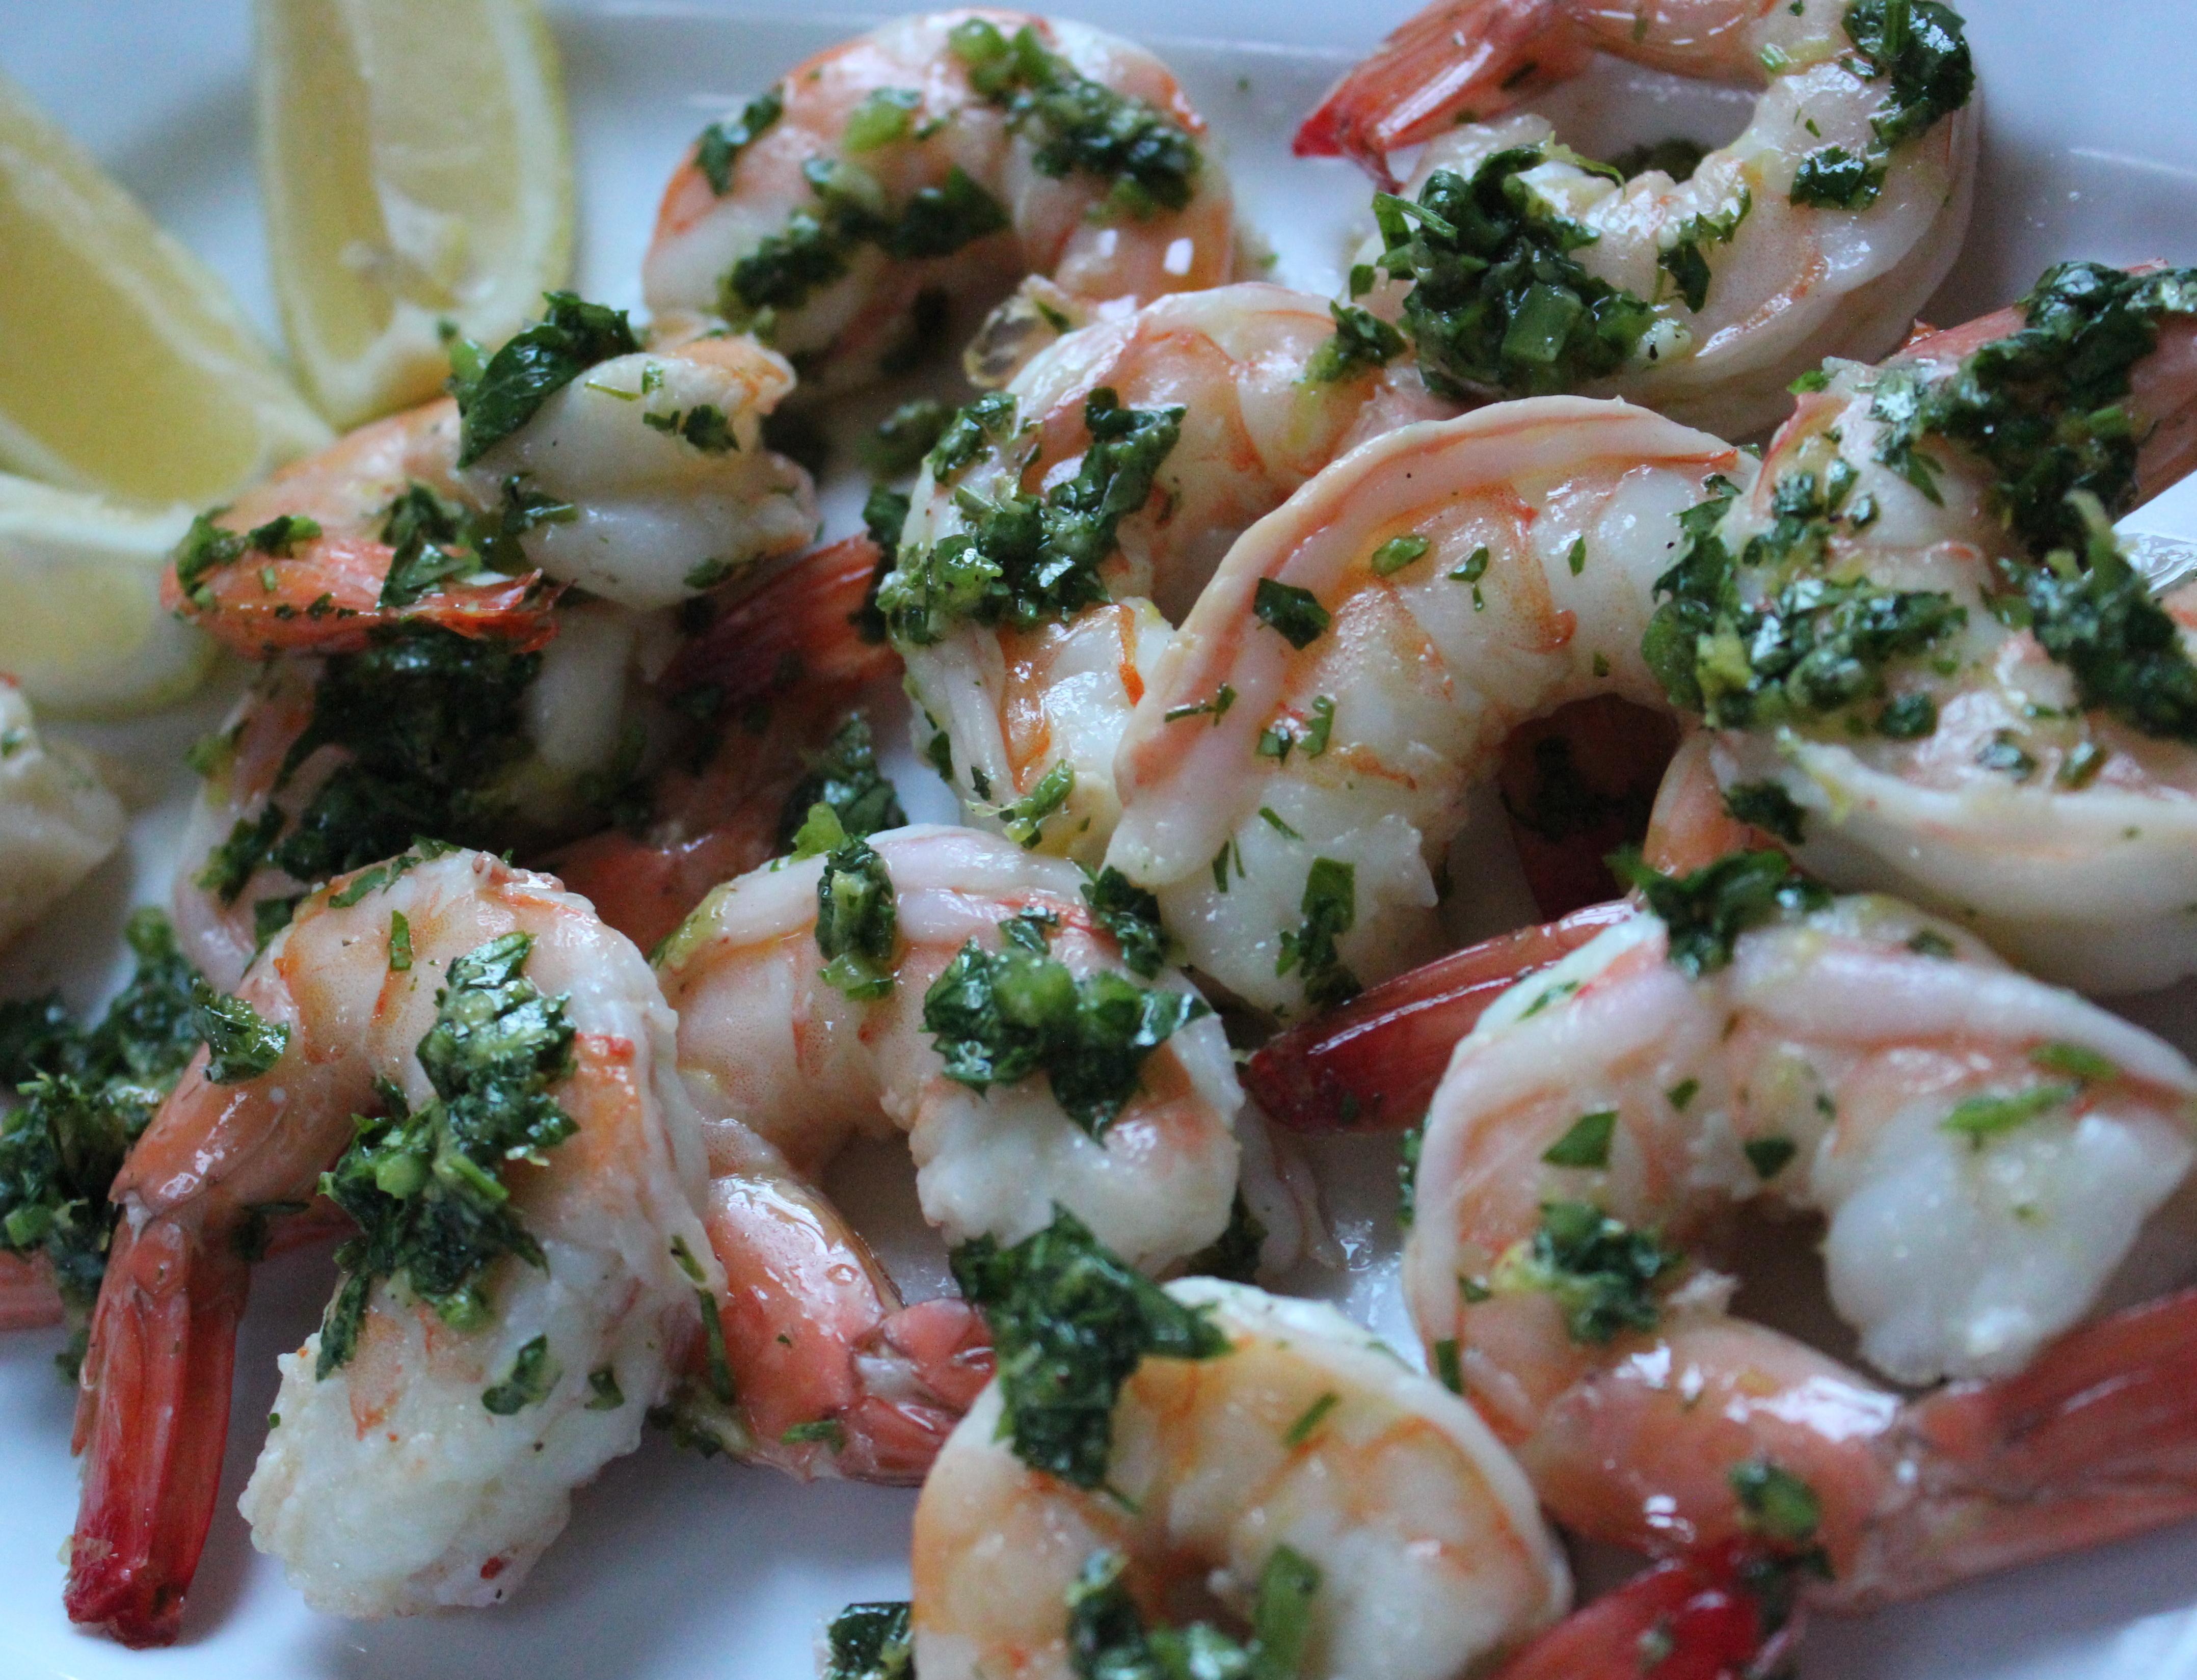 Chili Gremolata w/ Roasted Shrimp   Queen Jeanne's Cuisine